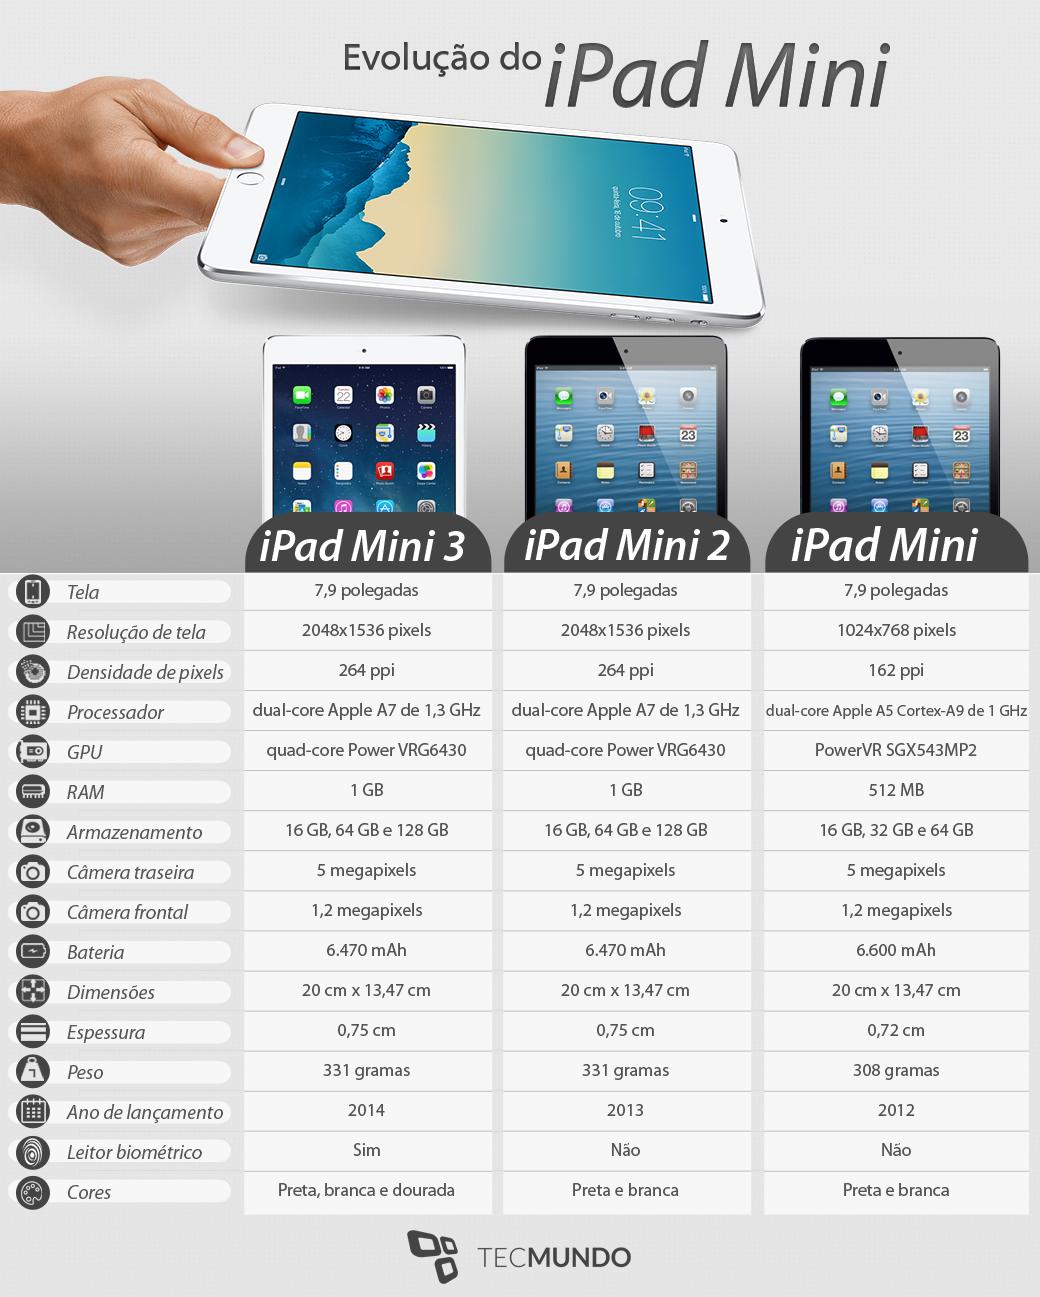 A evolução do iPad Mini